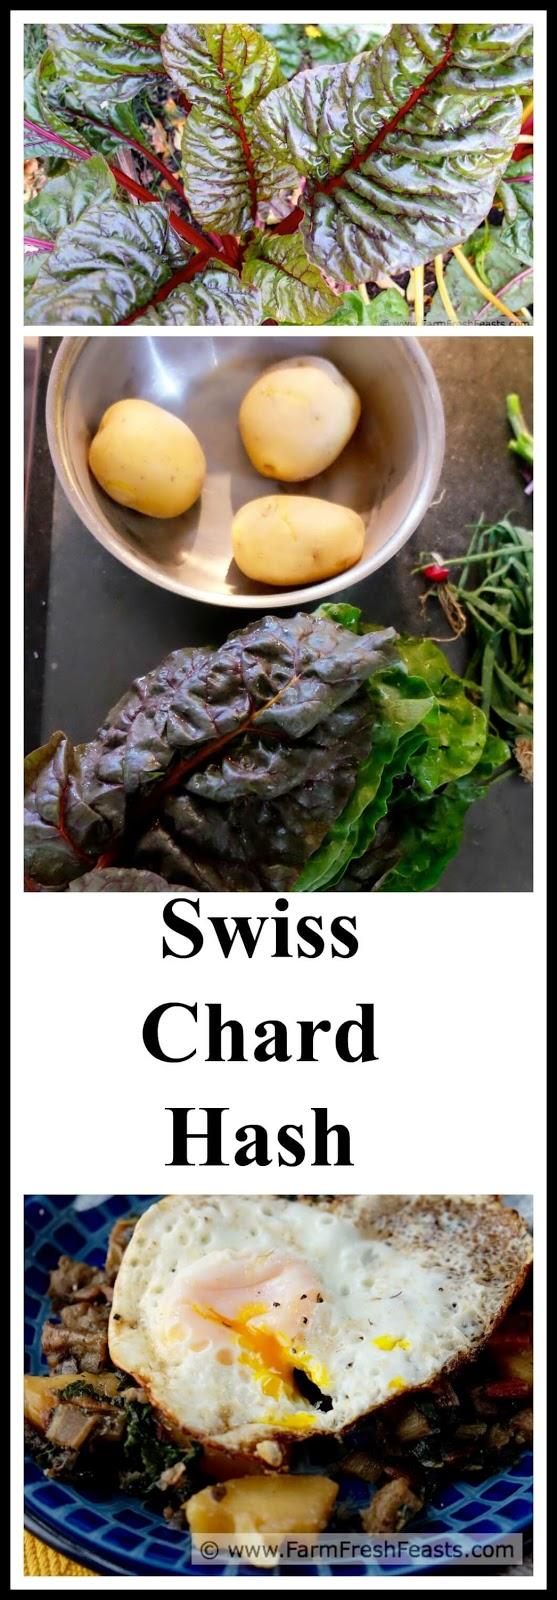 http://www.farmfreshfeasts.com/2015/09/swiss-chard-hash.html